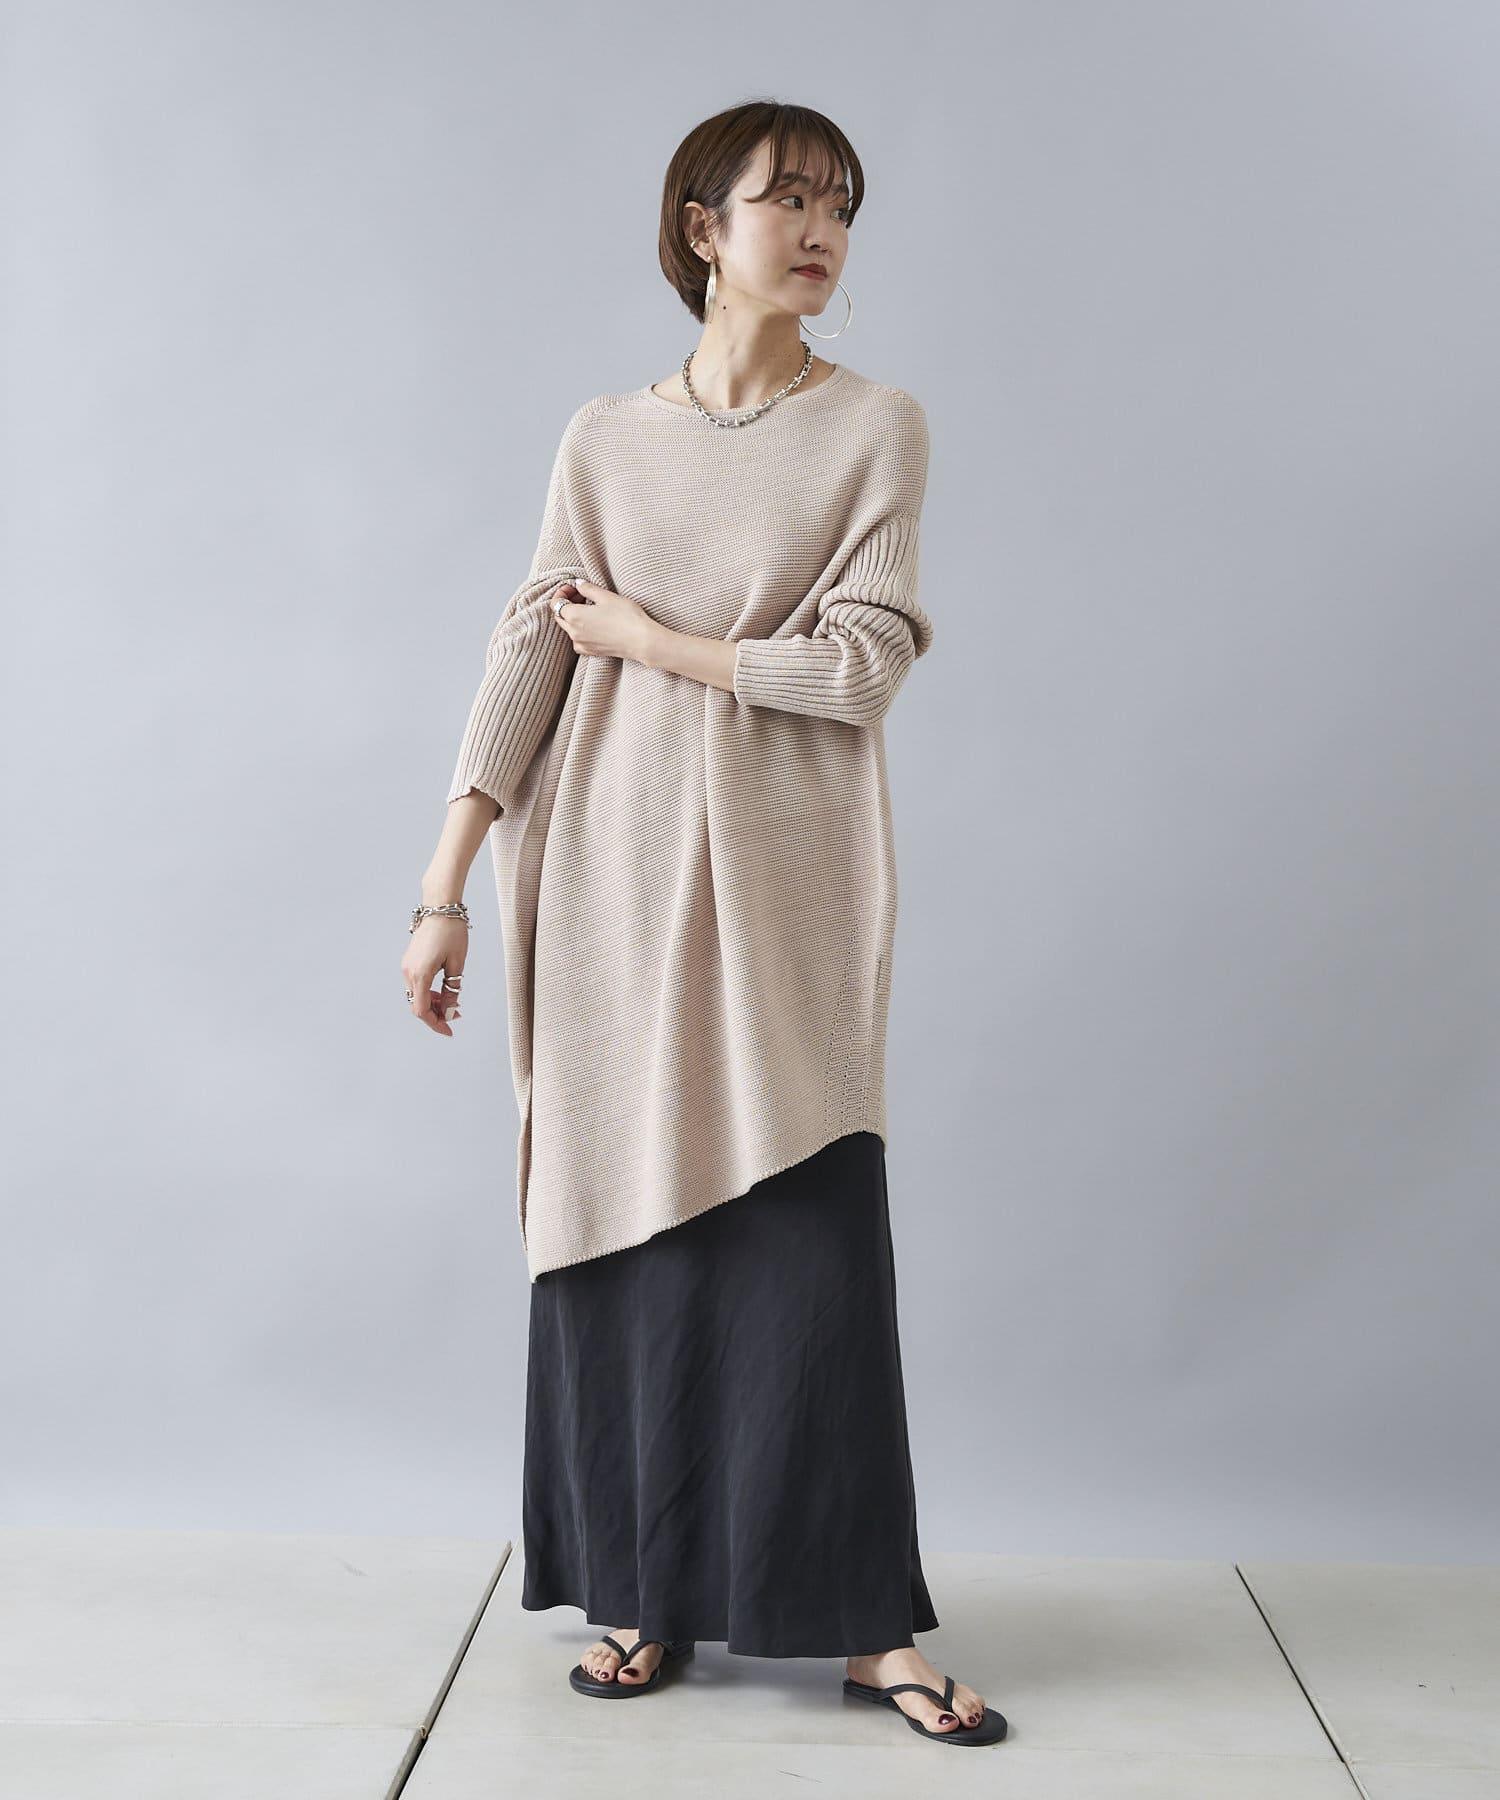 DOUDOU(ドゥドゥ) 【追加予約】麻混ソフトマーメイドスカート